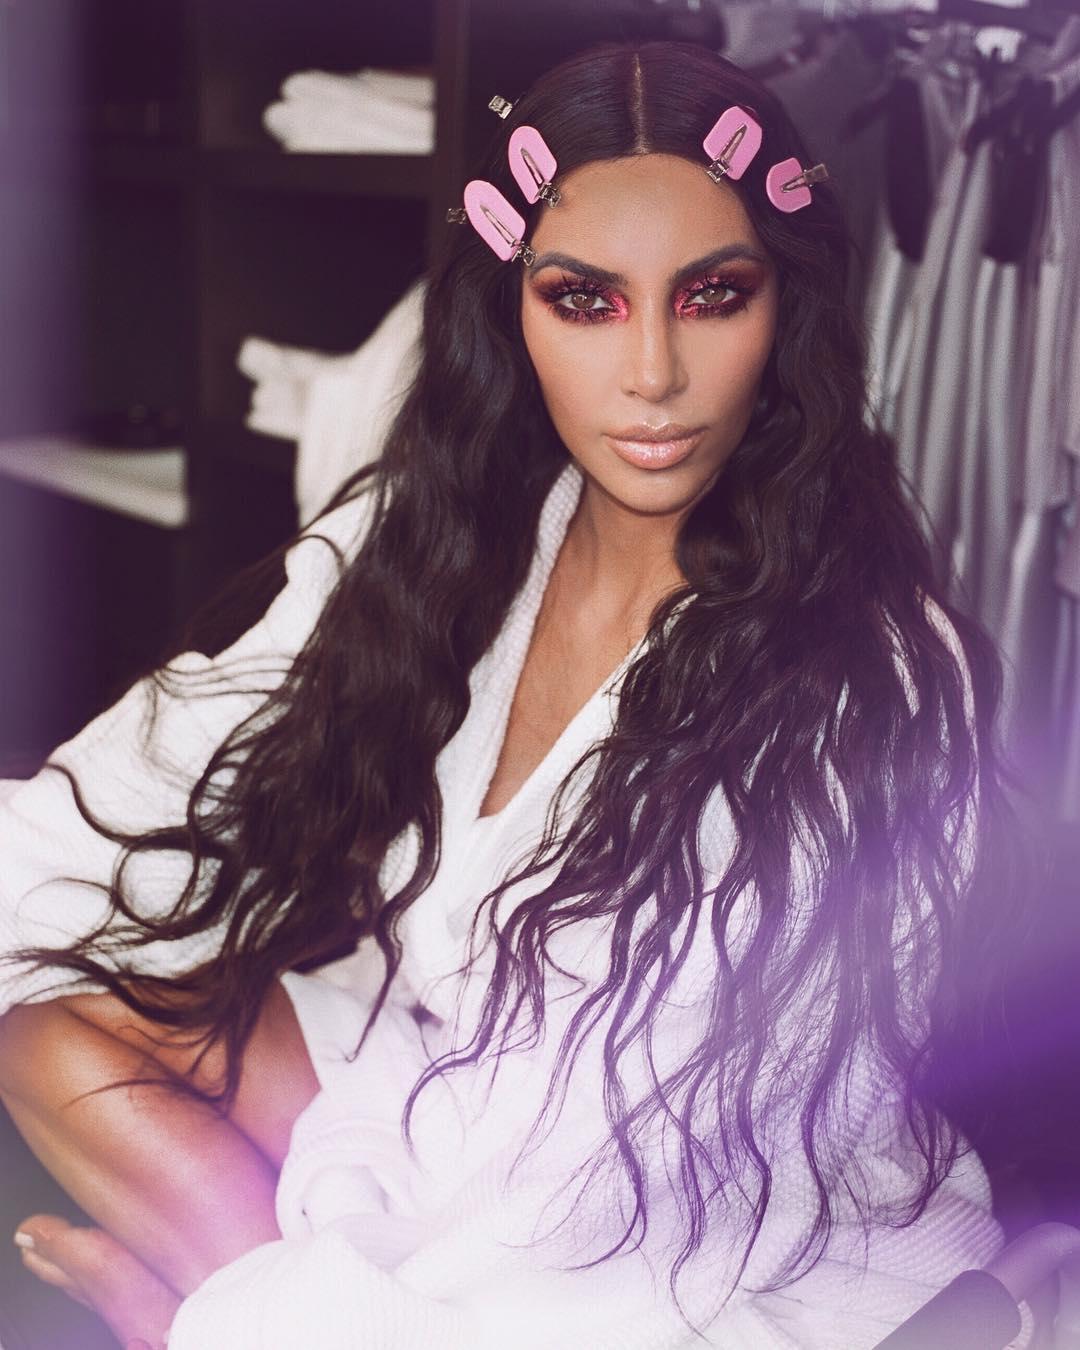 Kim Kardashian With Amazing Burgundy Freaky & Fire Eye Makeup By KKWBeauty 2019